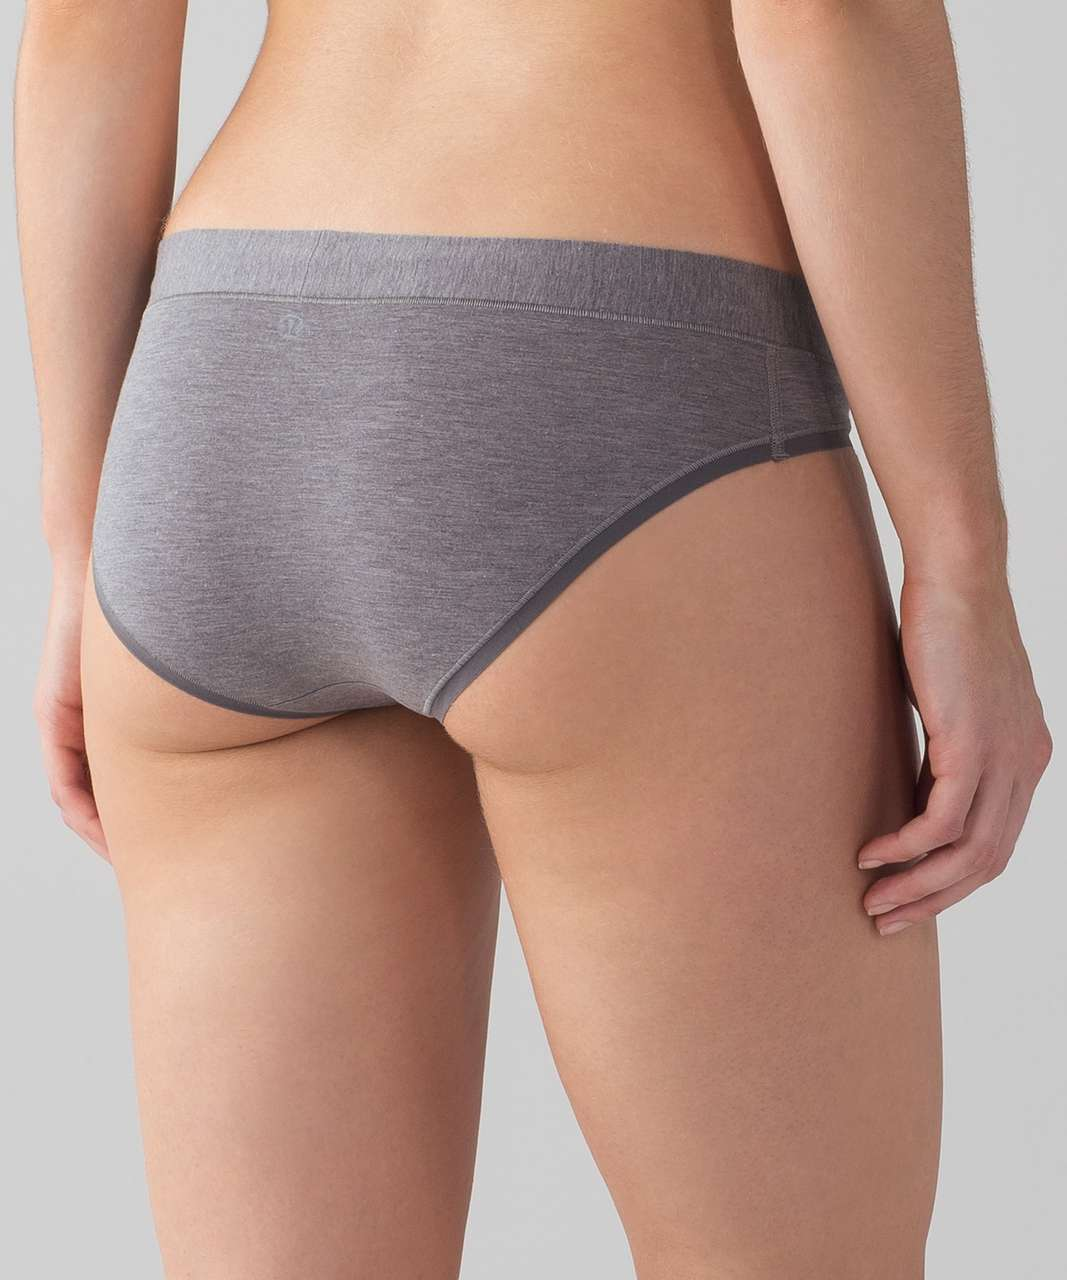 Lululemon Mula Bandhawear Bikini - Heathered Dark Carbon / Dark Carbon